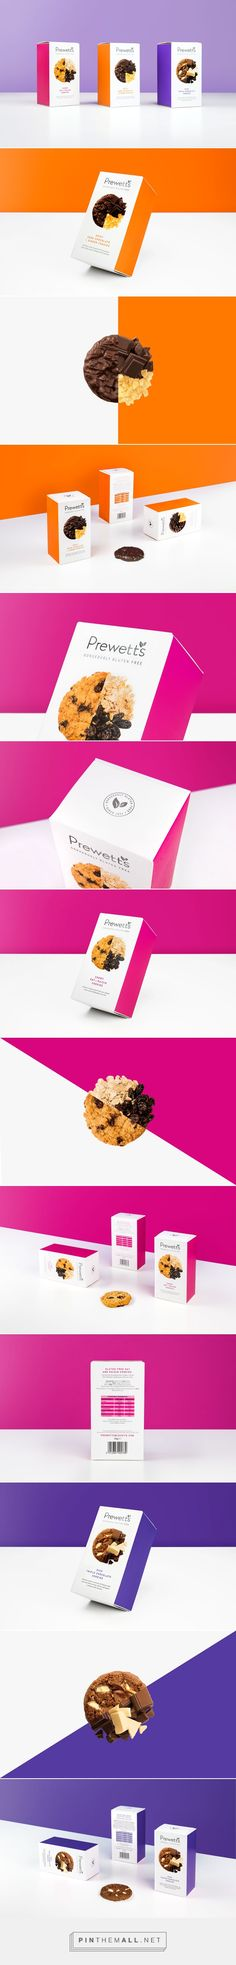 Prewetts Premium Gluten-free Cookies by Robot Food